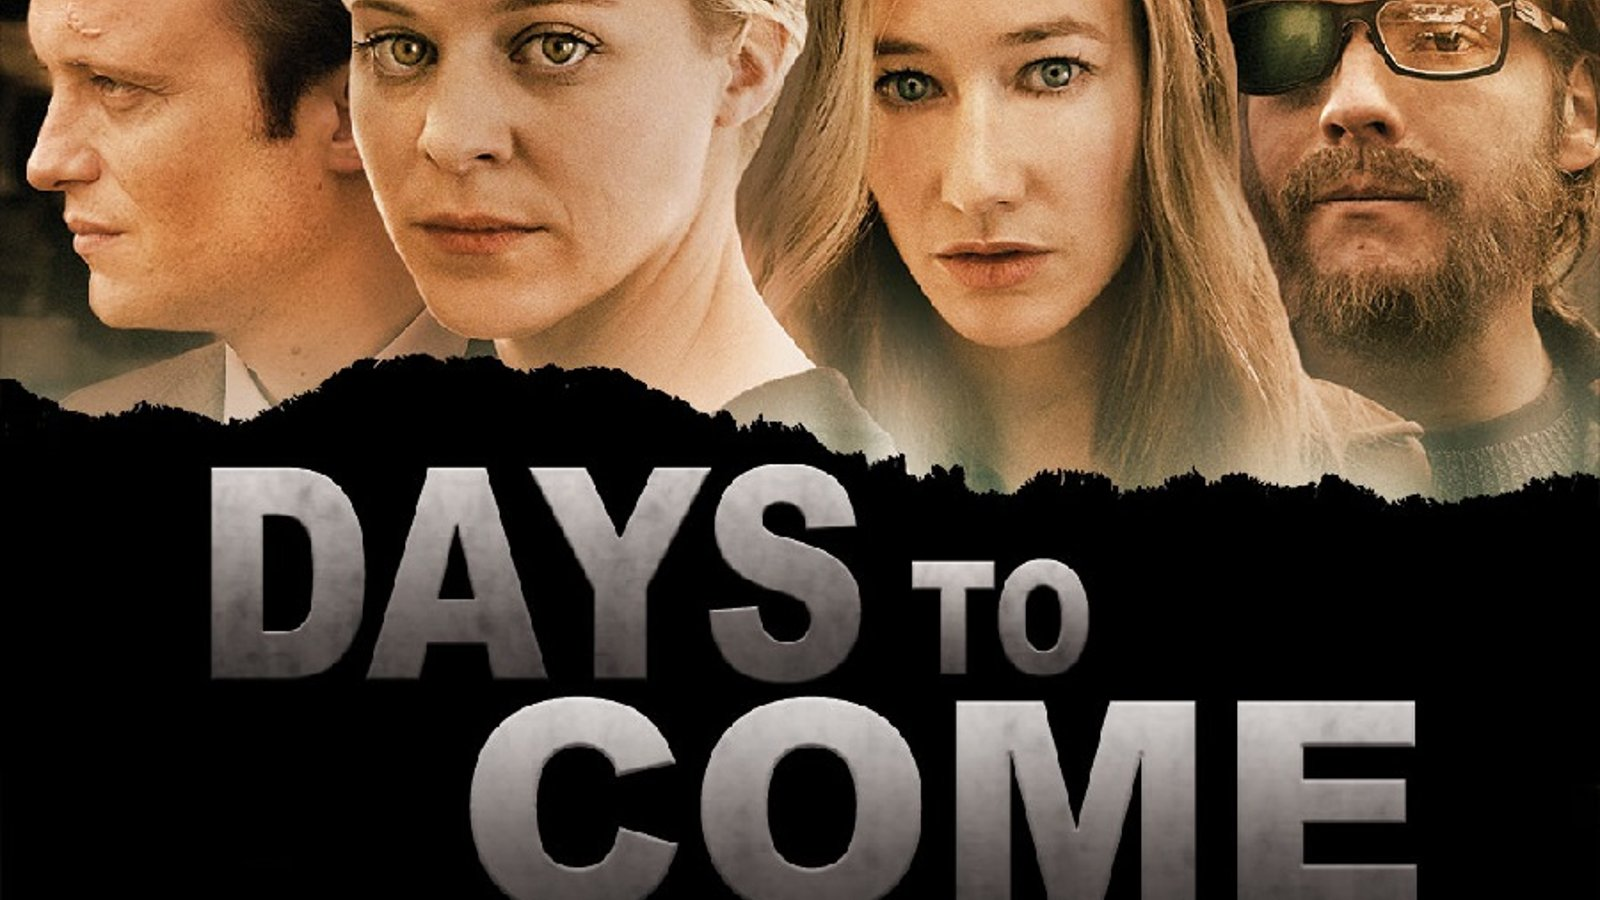 Days to Come - Die kommenden Tage